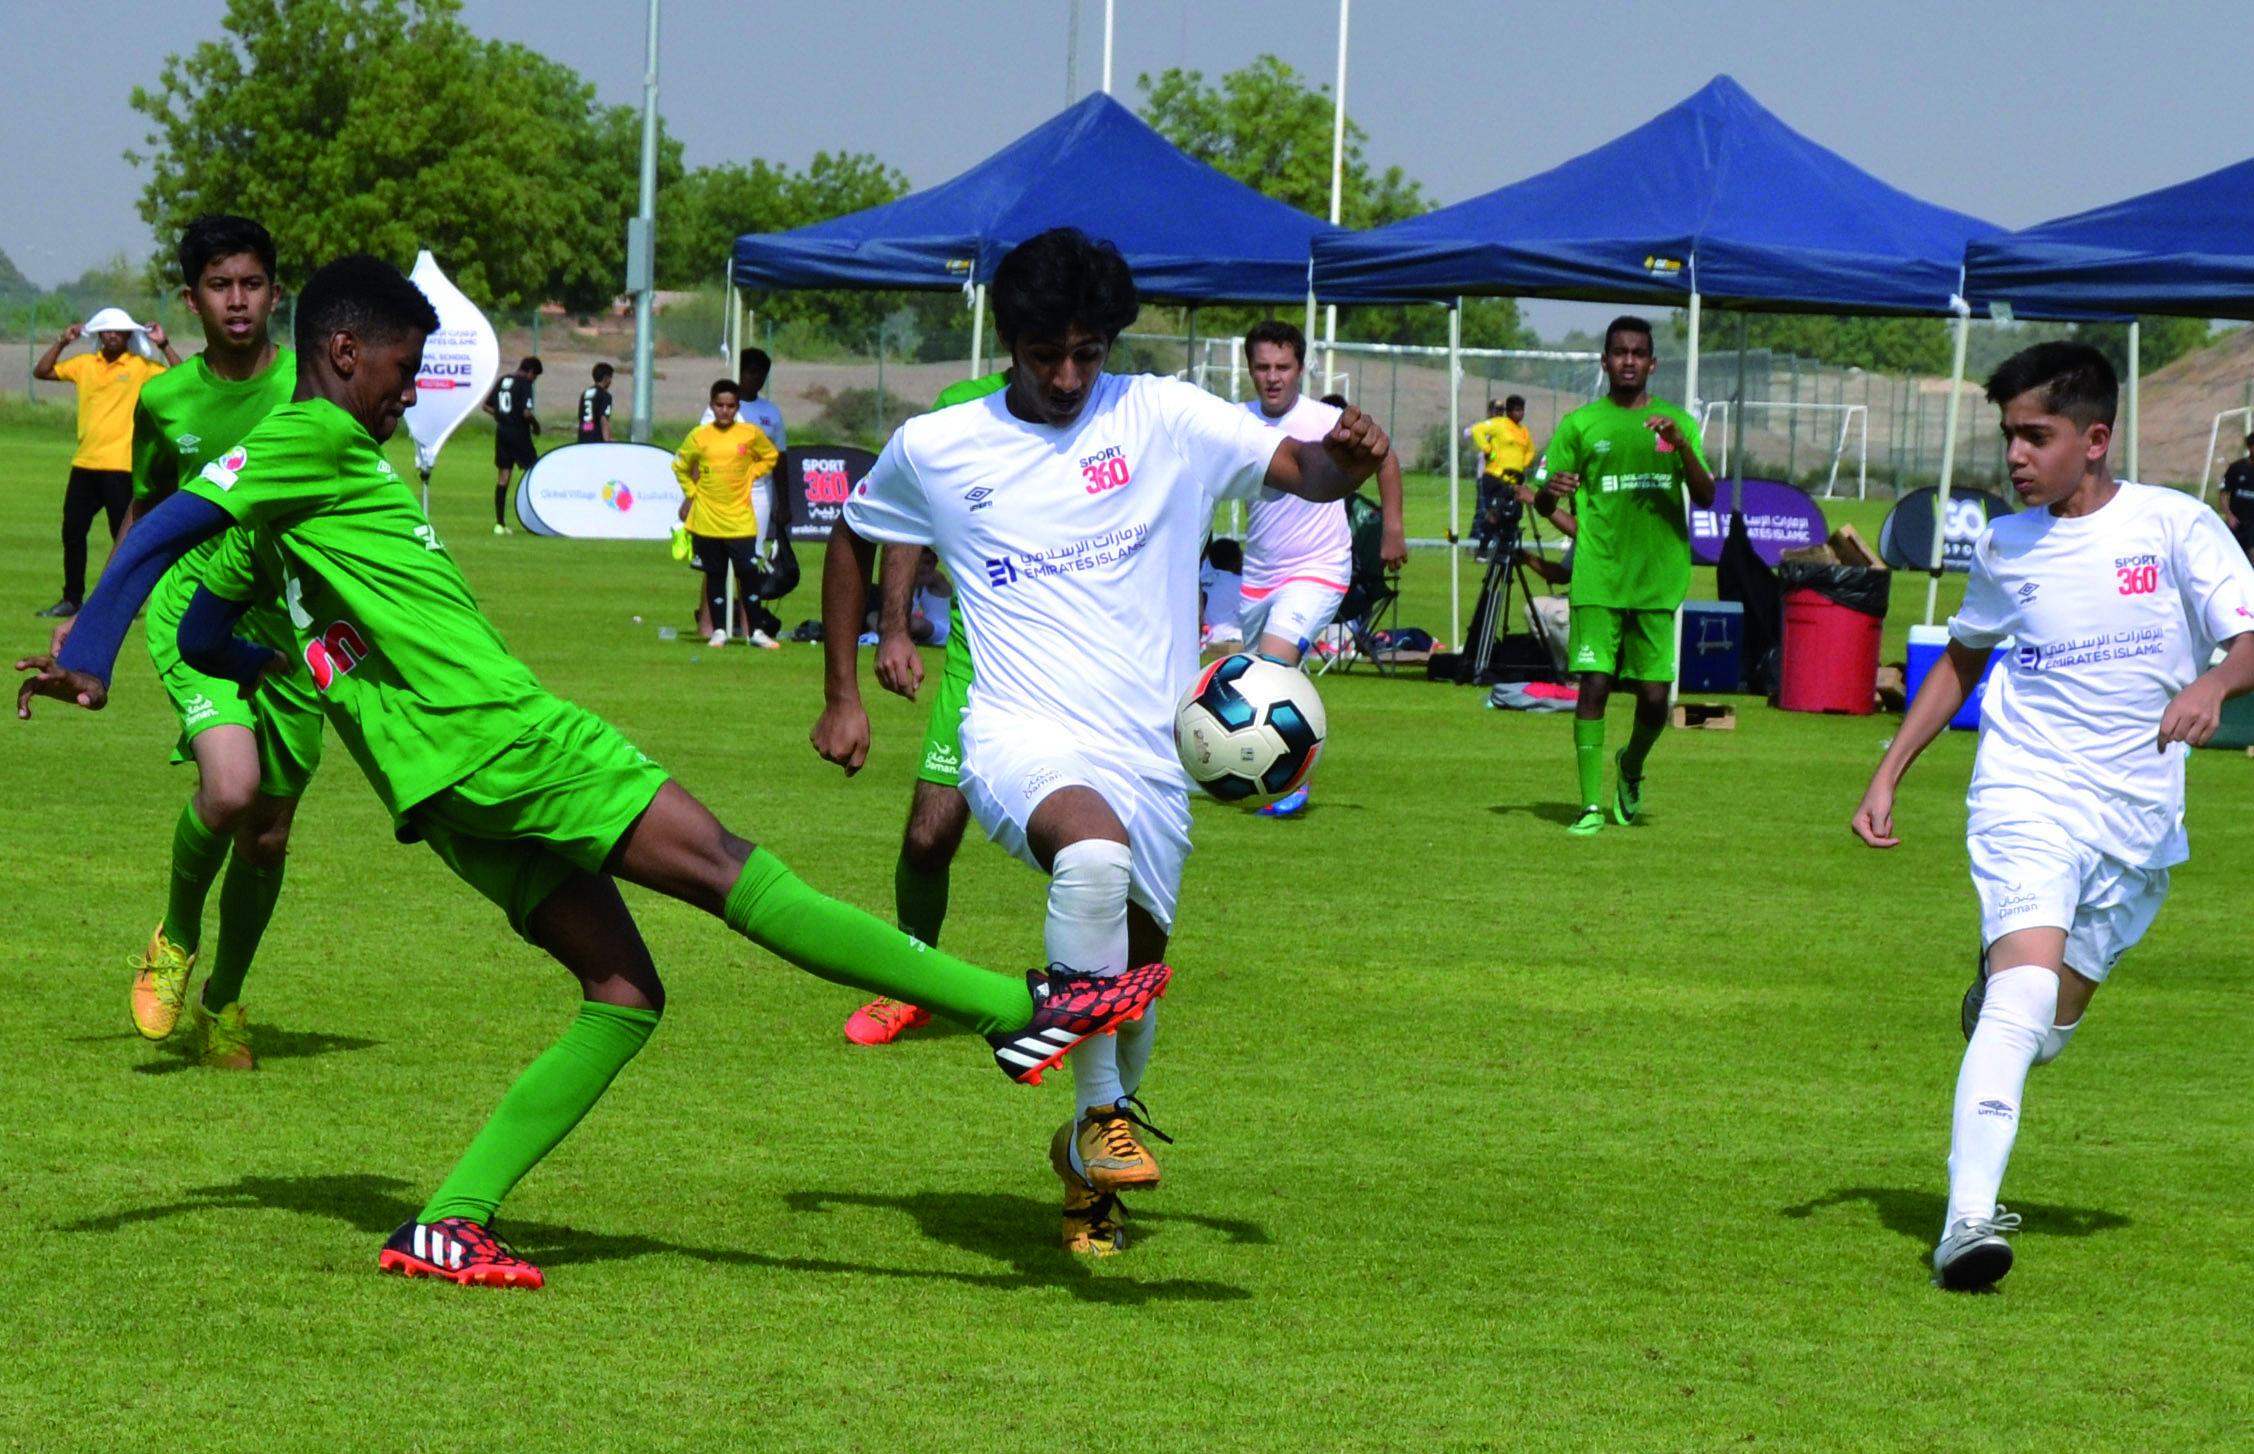 NSL360 Football Week 5 – Al Ain Round-Up - Video - Sport360